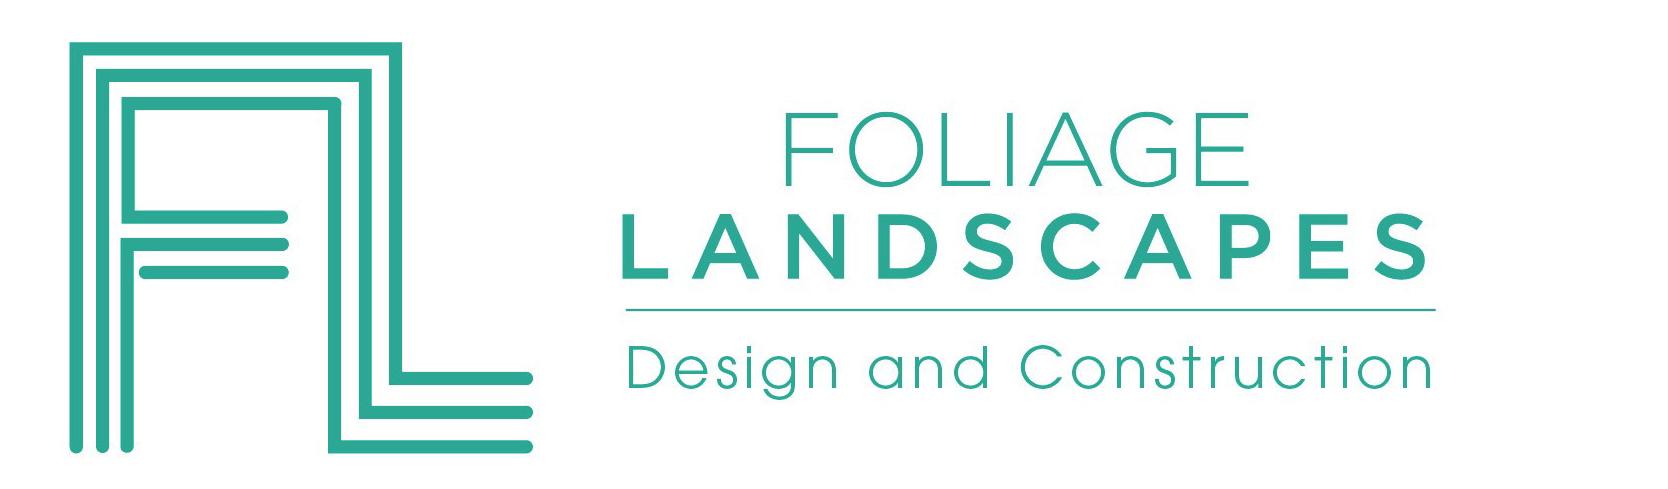 Foliage Landscapes Pty Ltd